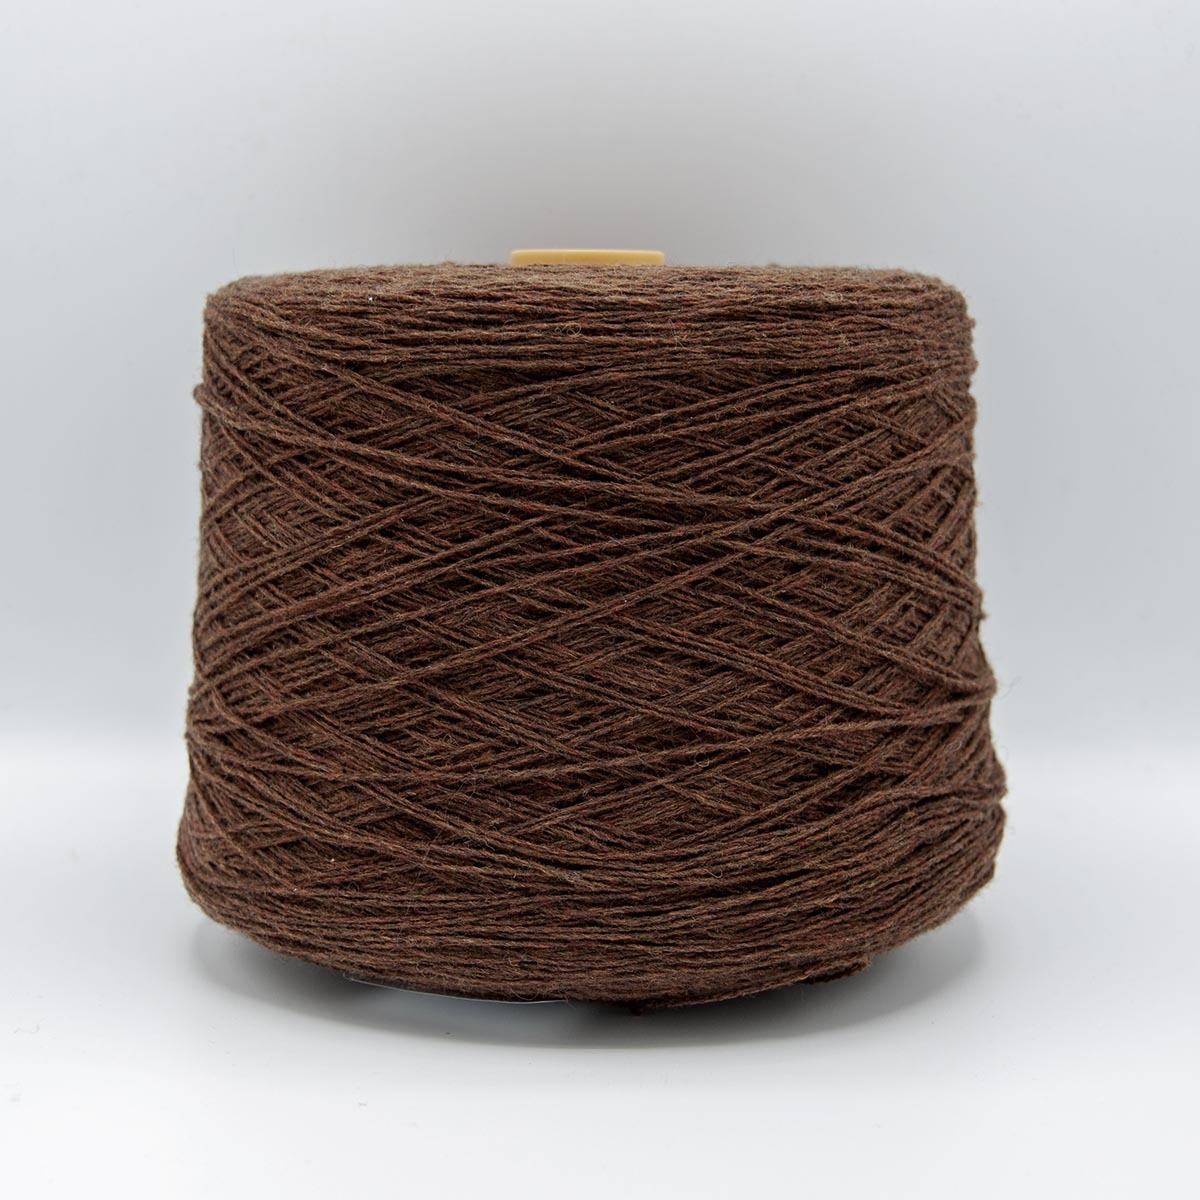 Knoll Yarns Merino Lambswool - 351